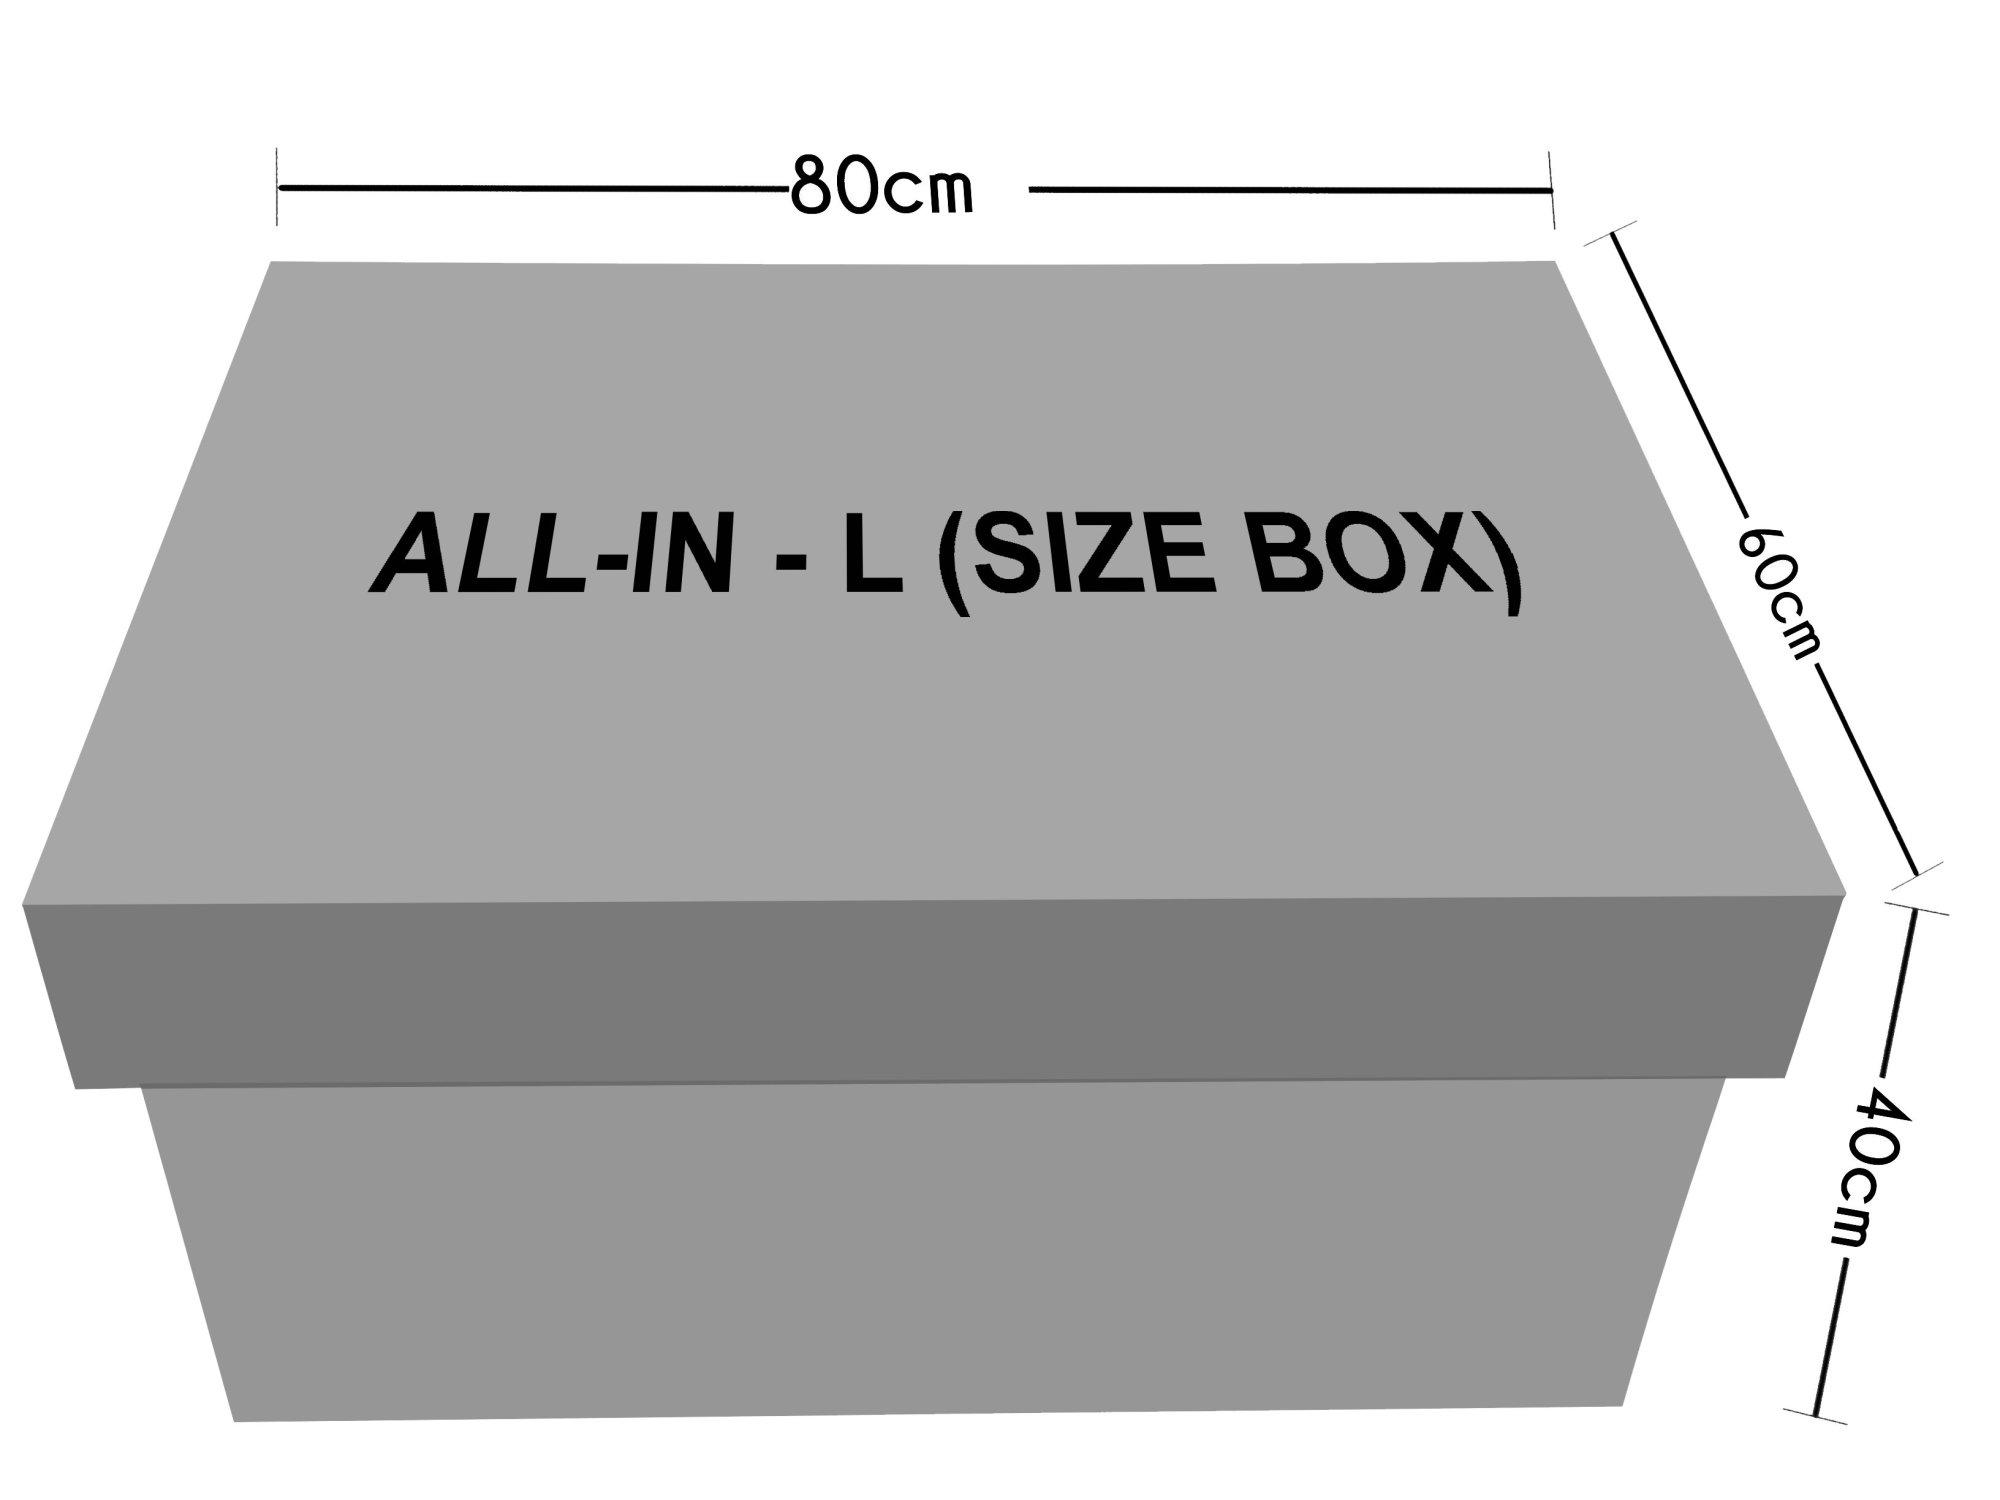 hight resolution of box sizes diagram wiring diagram box dimensions diagram